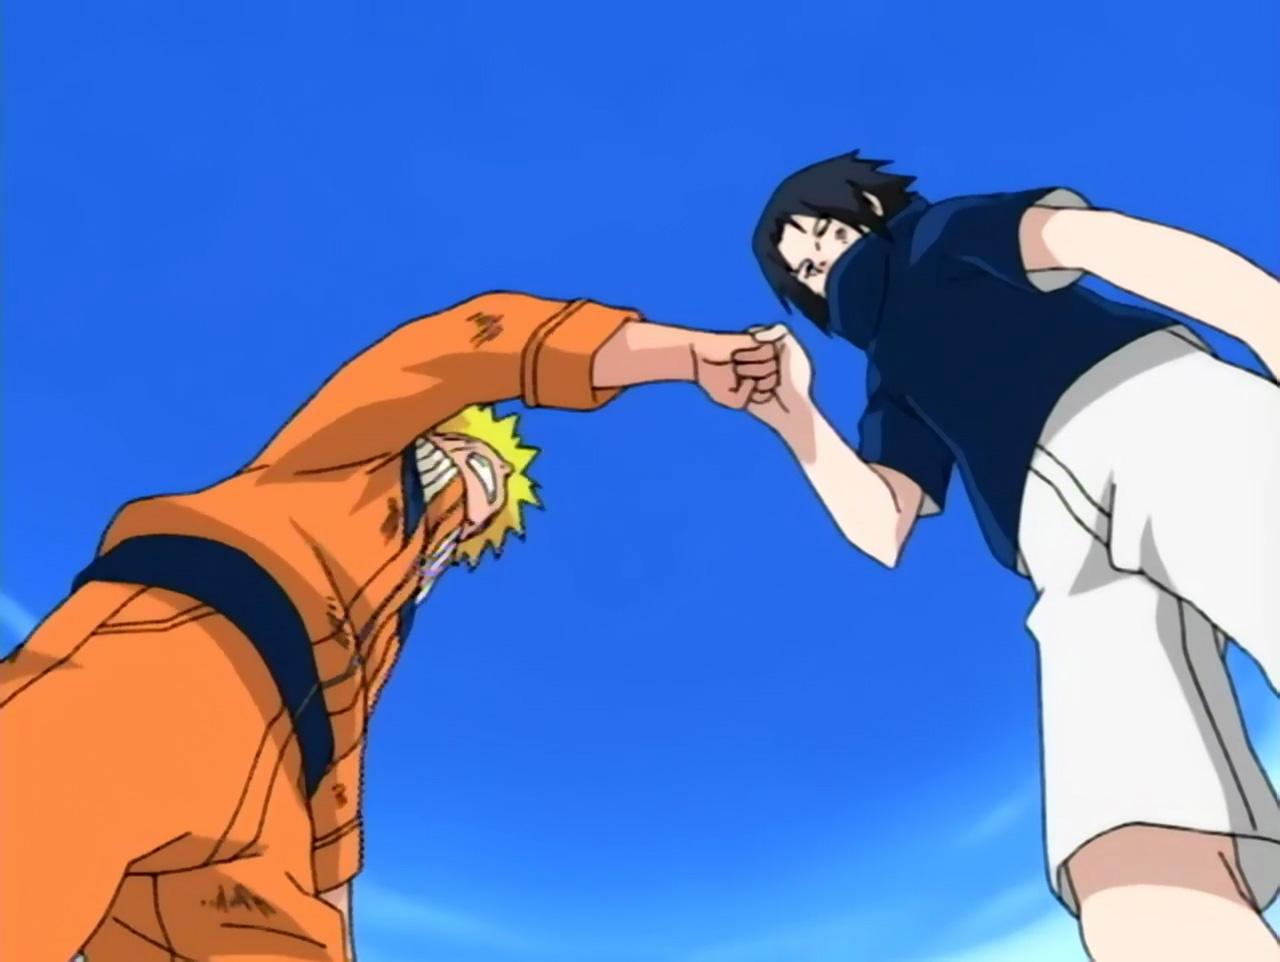 Resultado de imagen para naruto vs sasuke